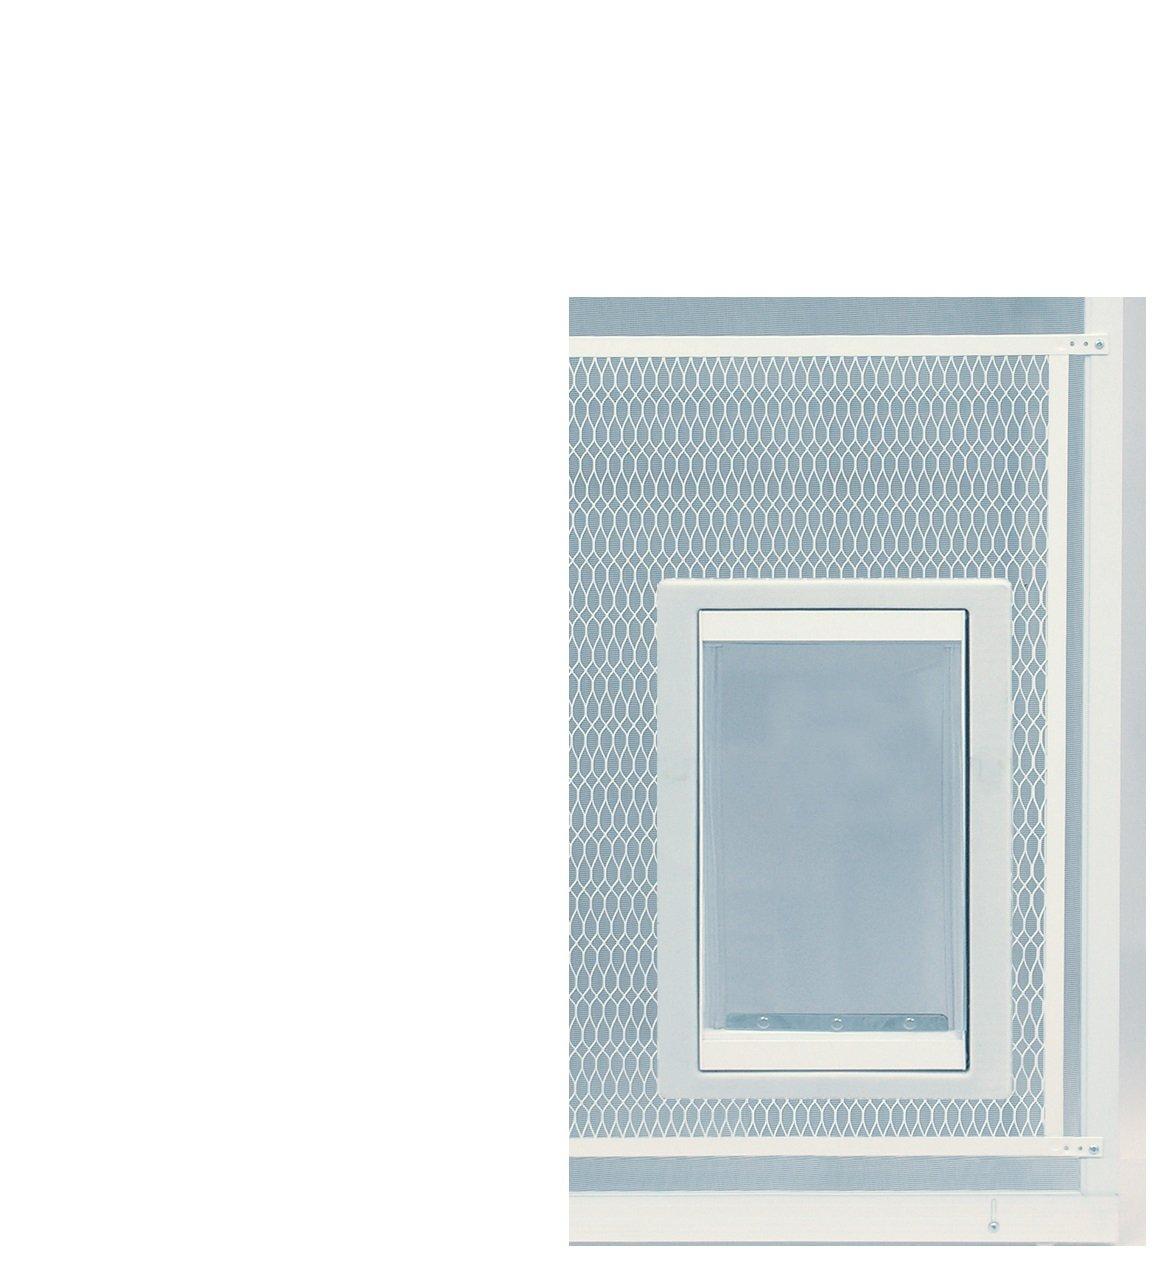 Ideal Pet Türen Displayschutzfolie Pet Tür, extra große, 26,7x 38,1cm Lasche Größe